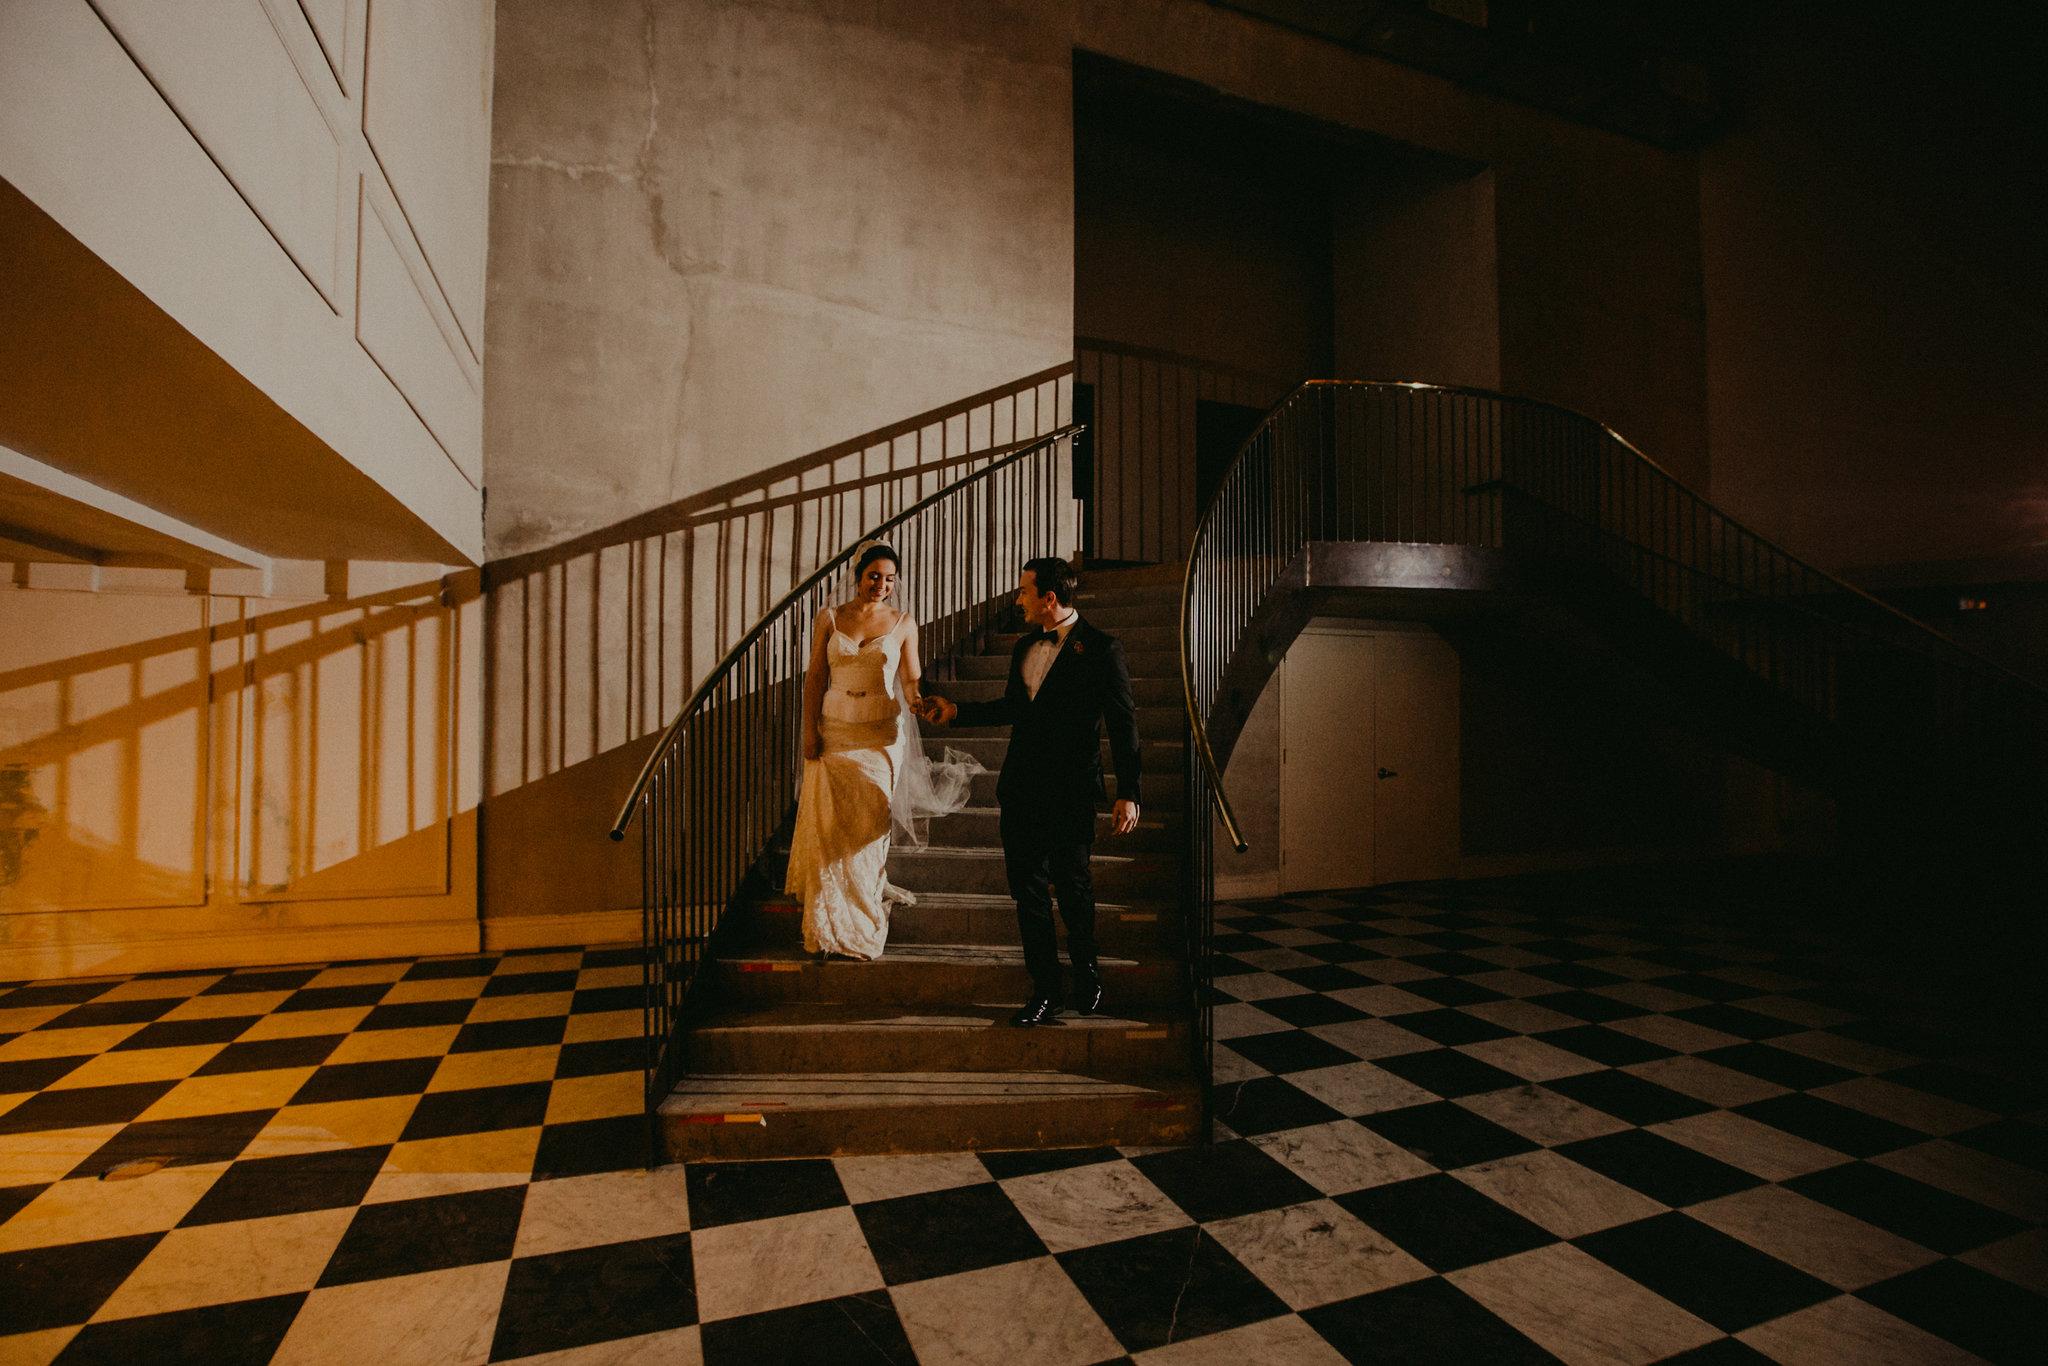 Williamsburg_Hotel_Wedding_Photographer_Chellise_Michael_Photography-289.jpg